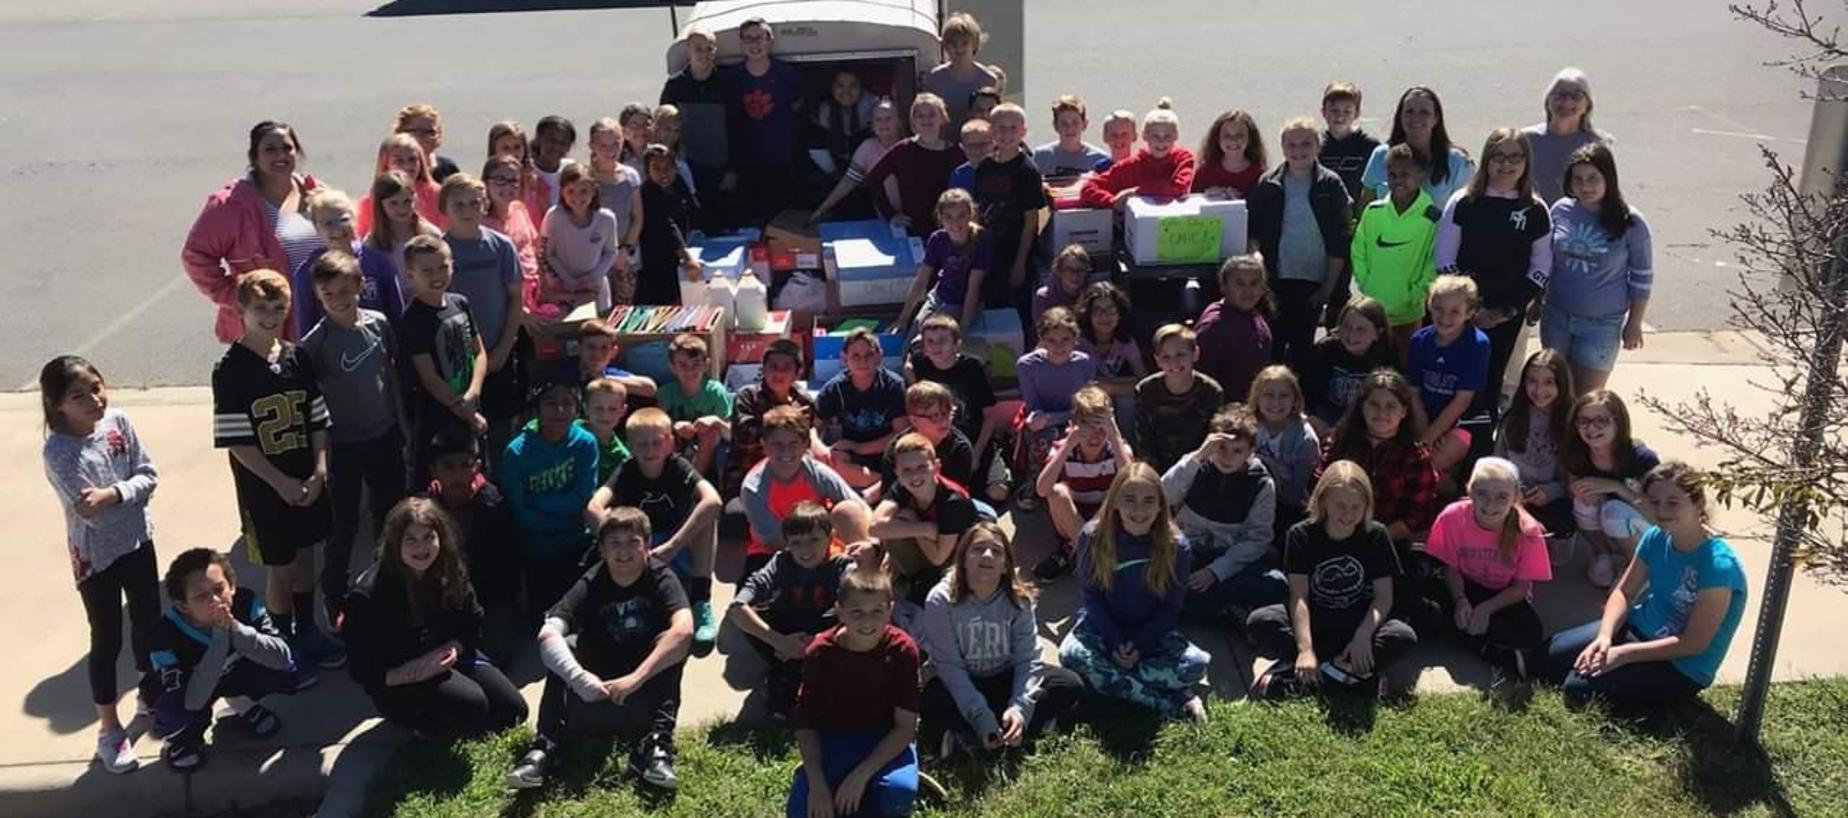 Hurricane Relief Fundraiser